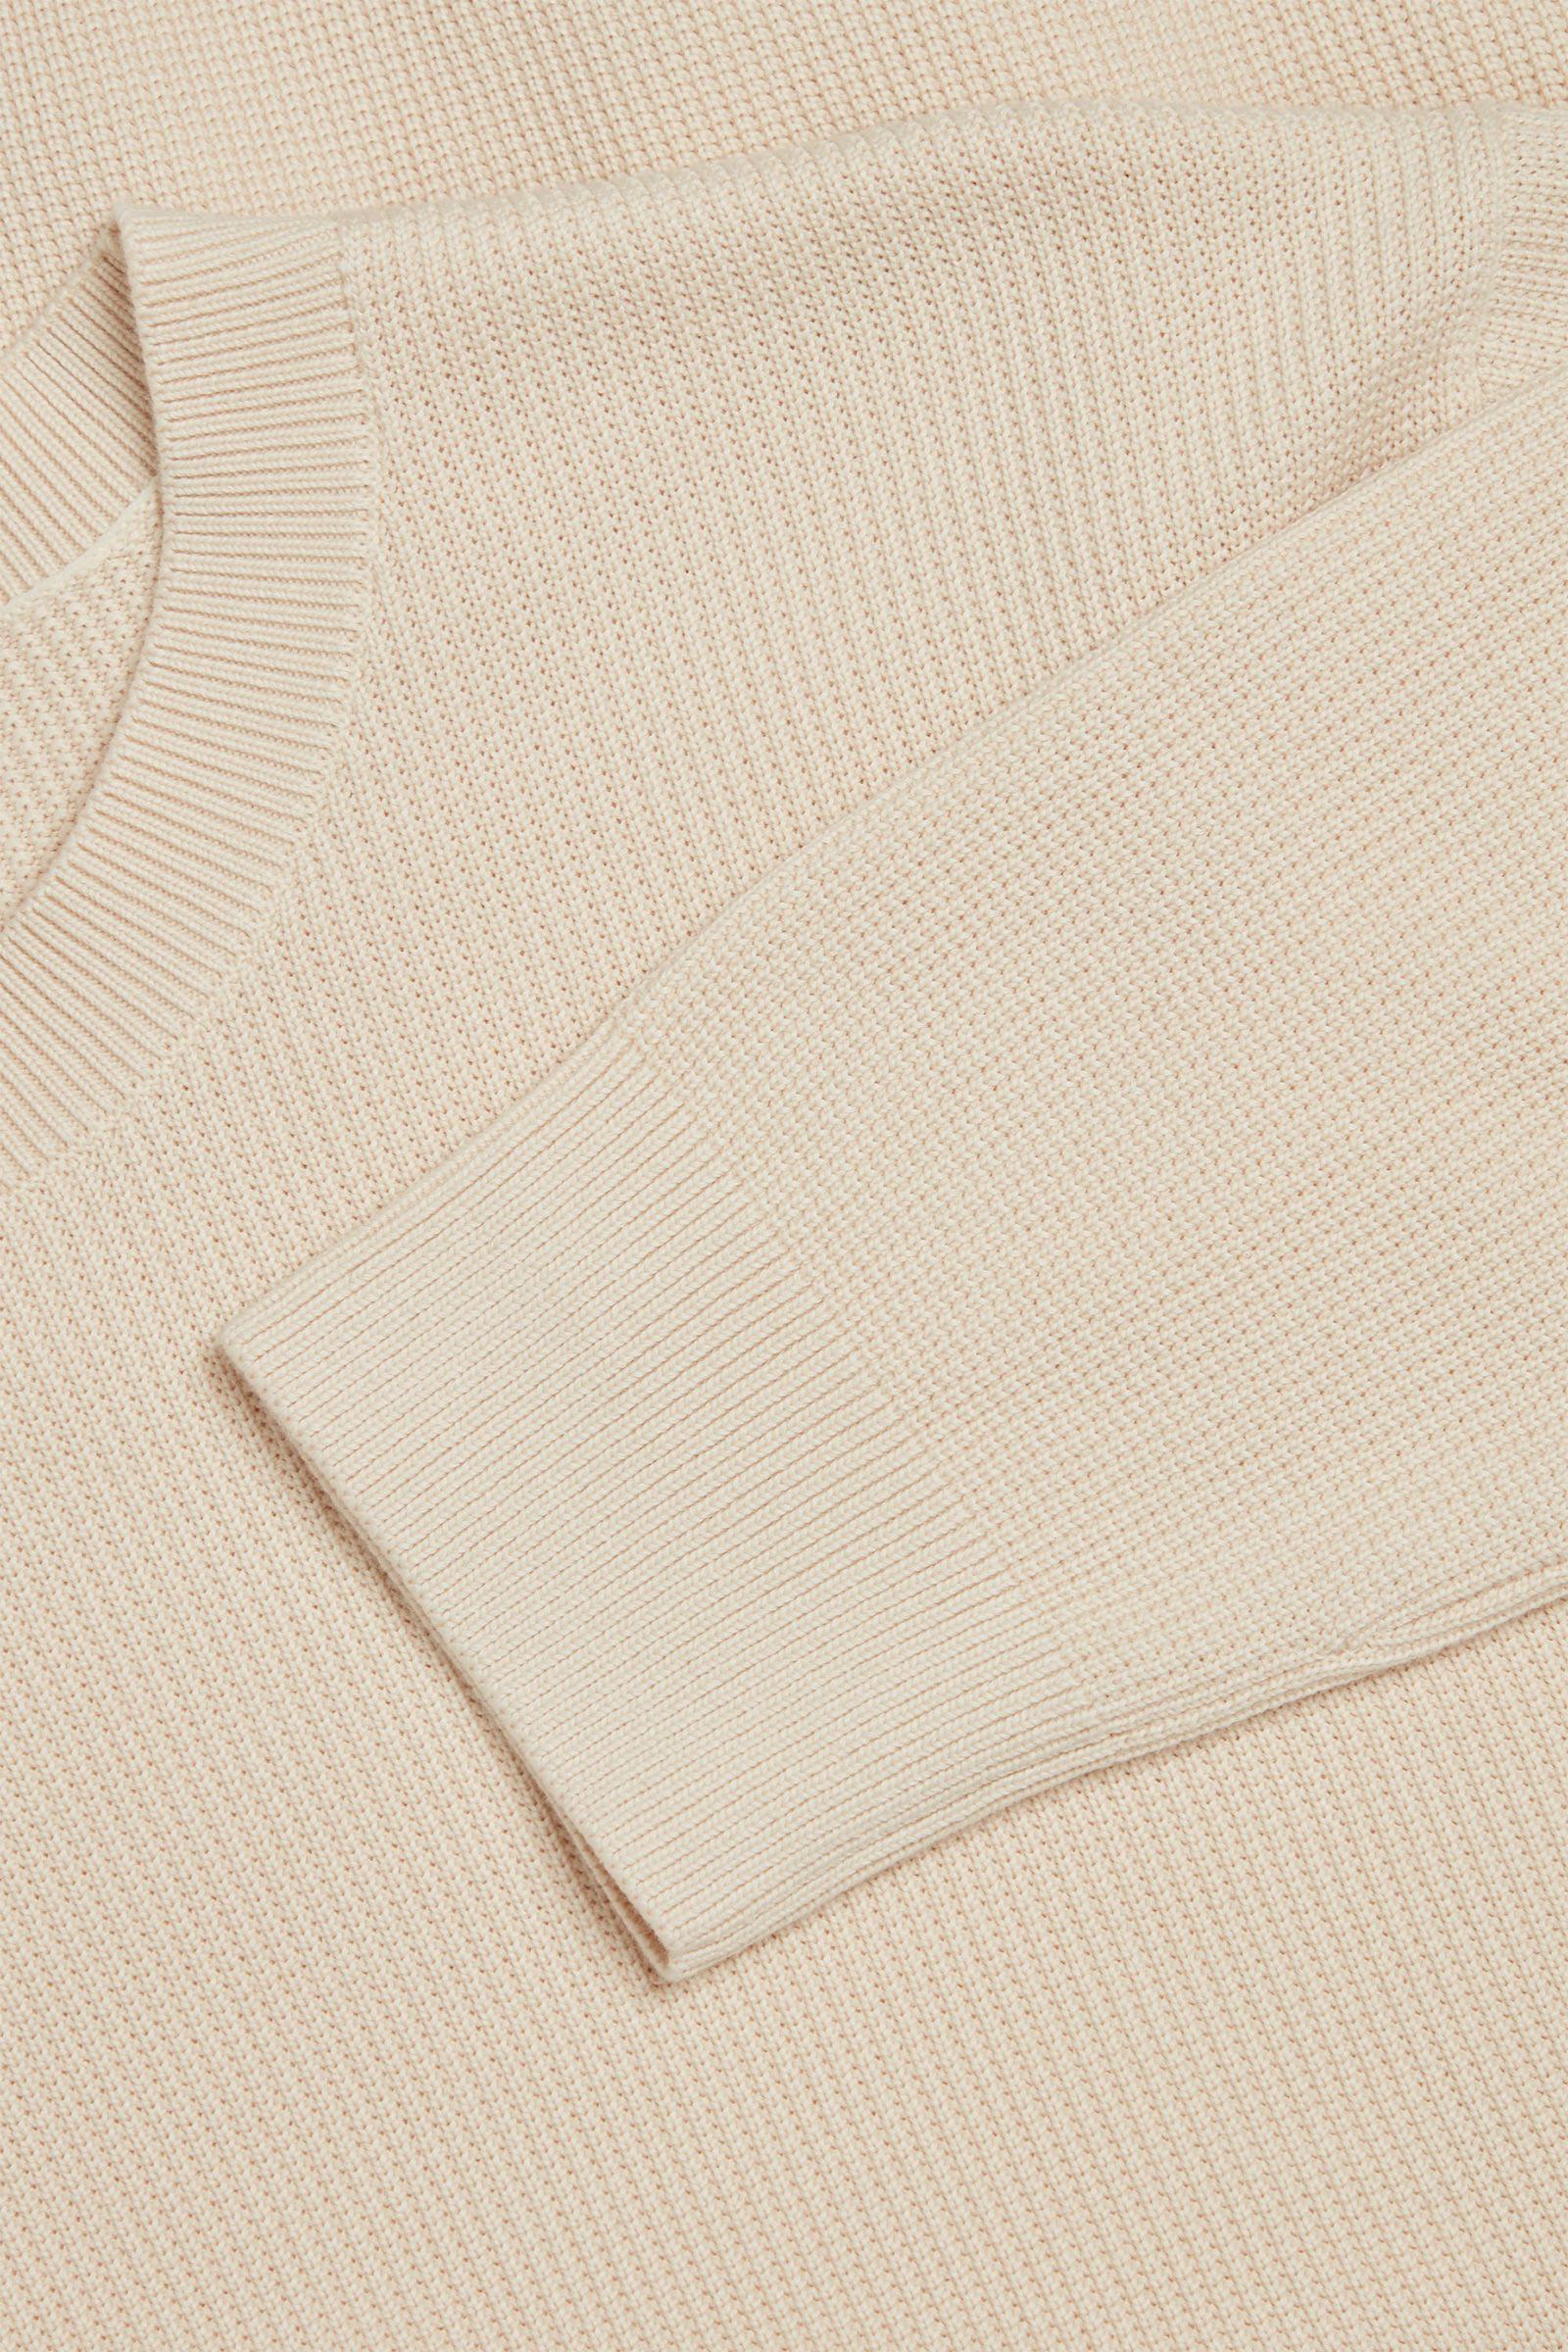 COS 오가닉 코튼 텍스쳐드 니트 스웨터의 베이지컬러 Detail입니다.